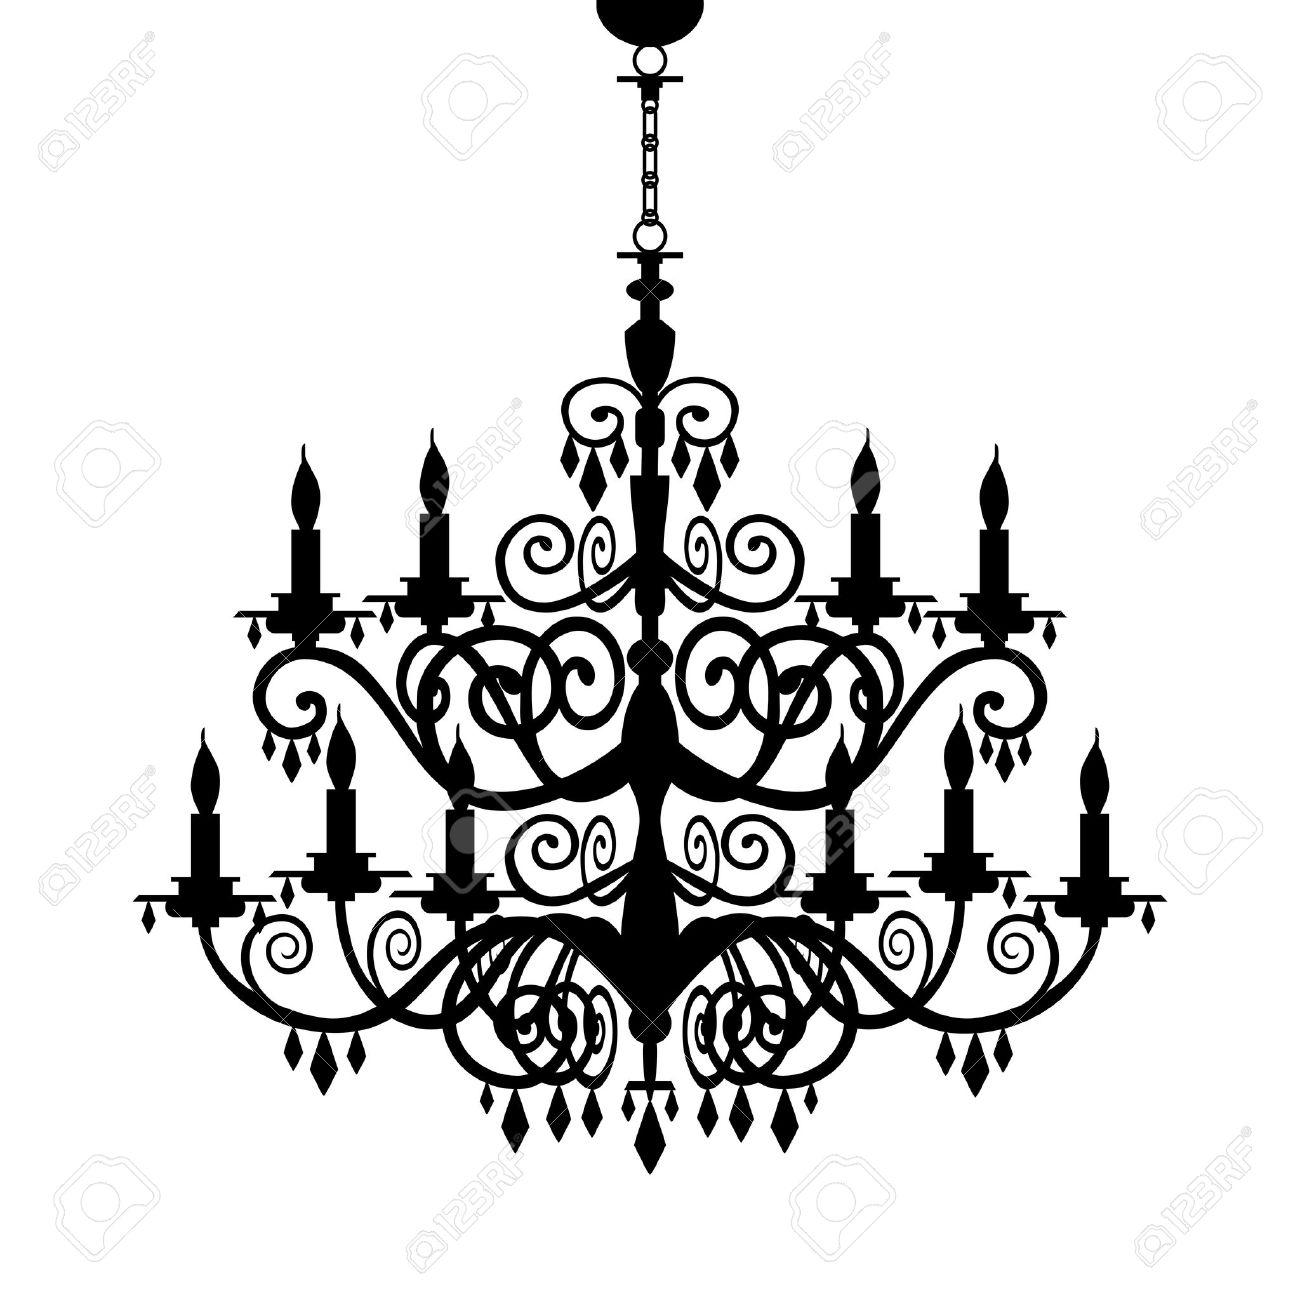 Baroque chandelier silhouette - 9351712